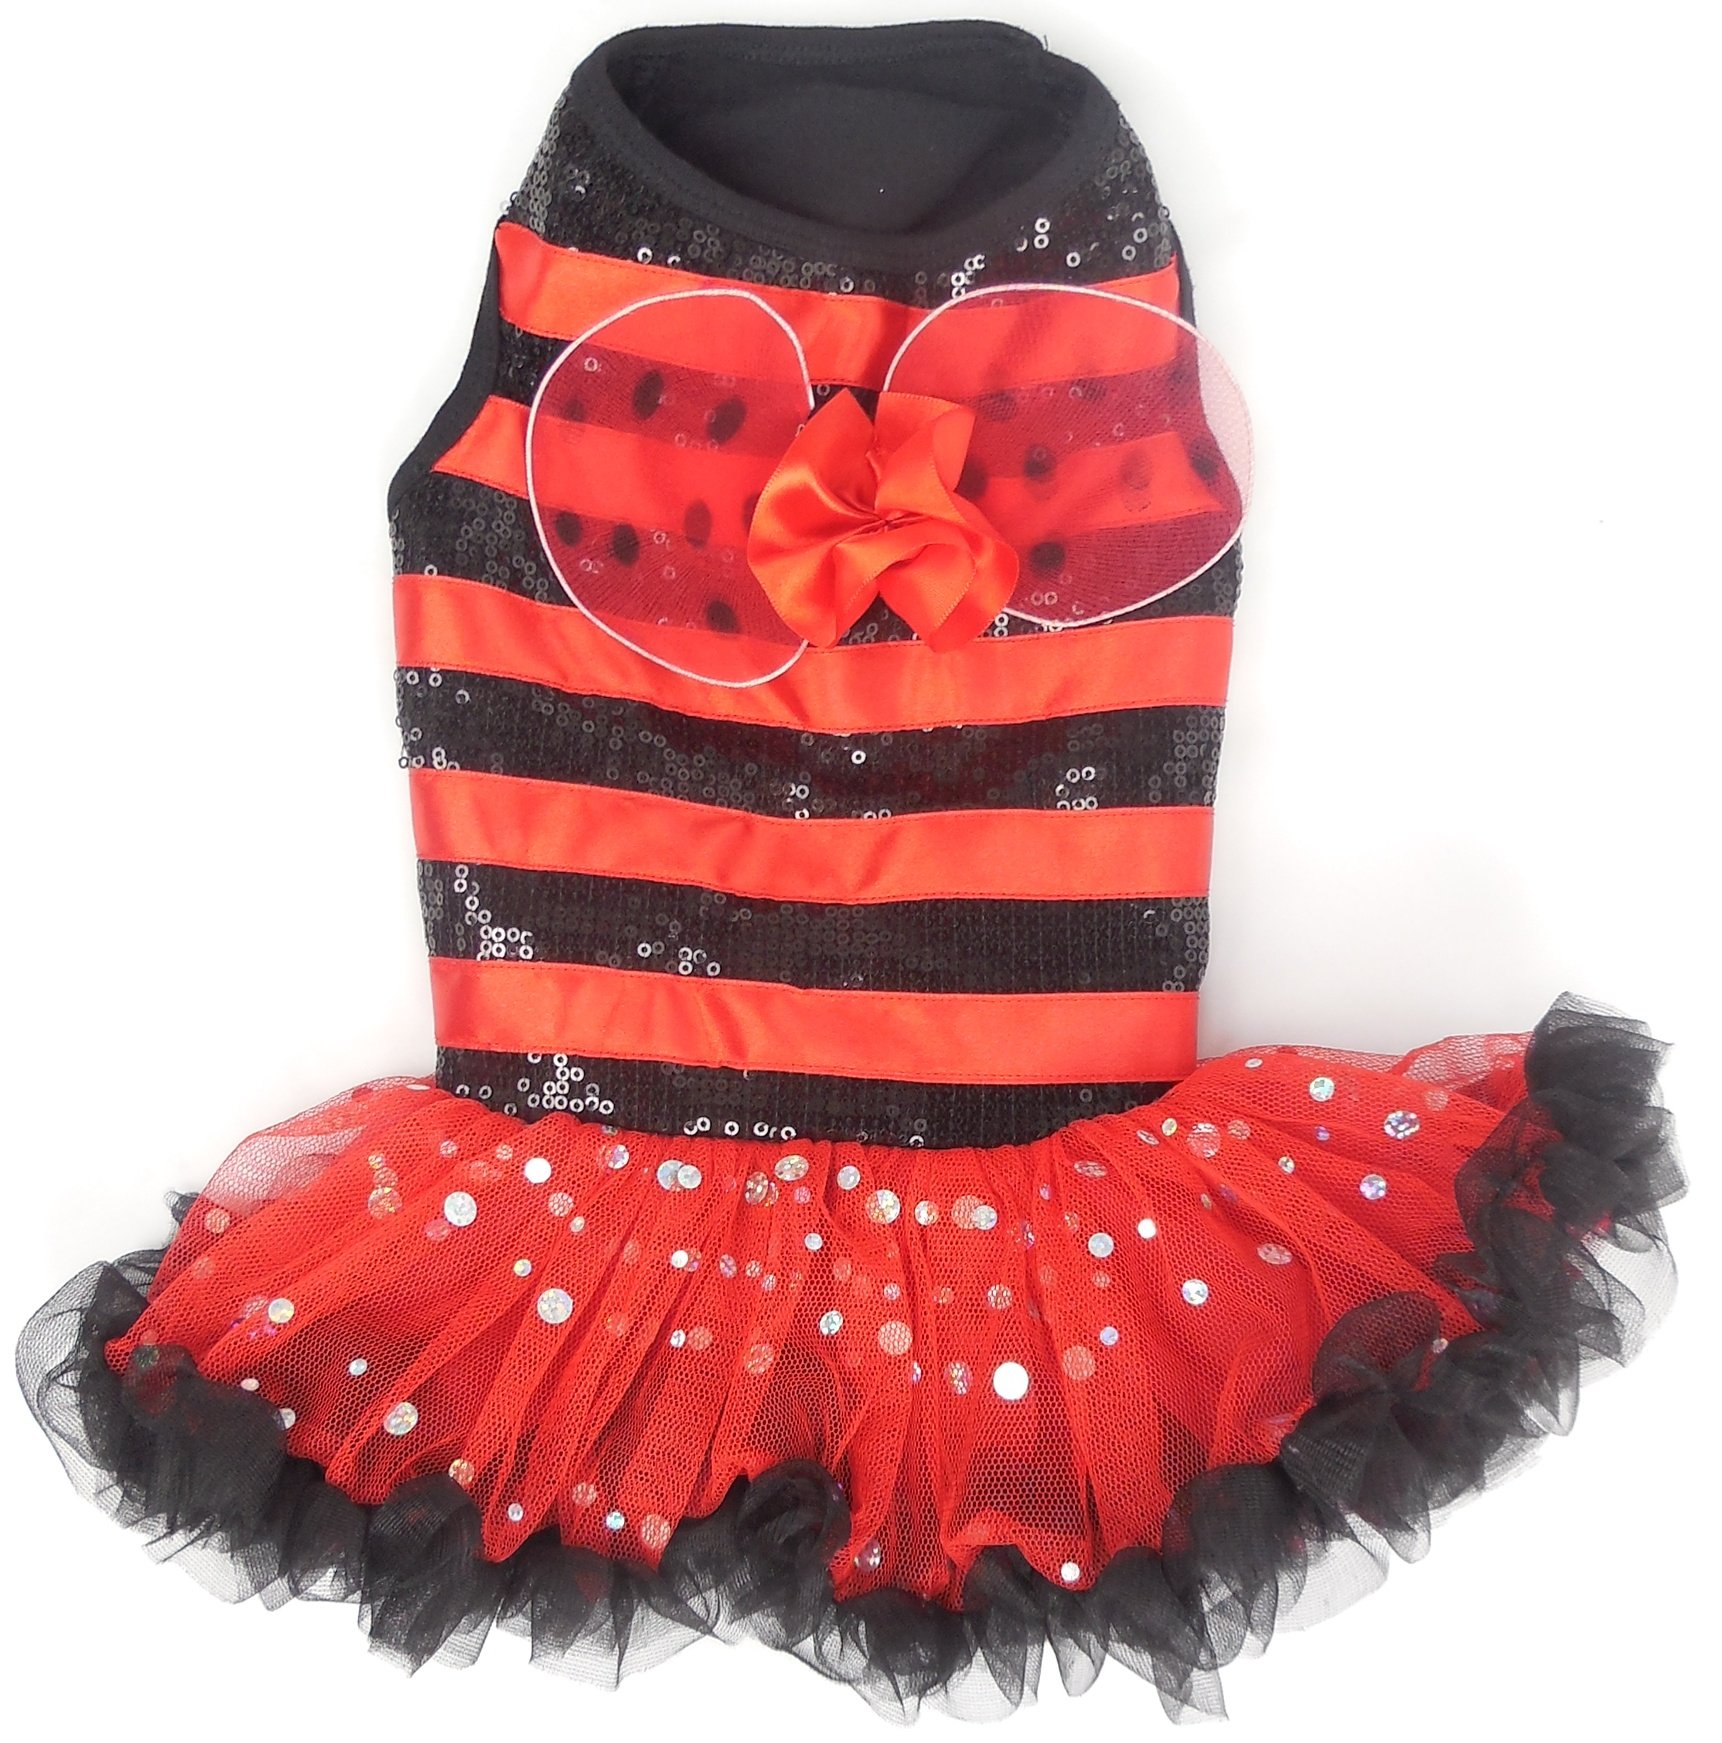 PAWPATU Ladybug Costume for Dogs, Small, Red/Black